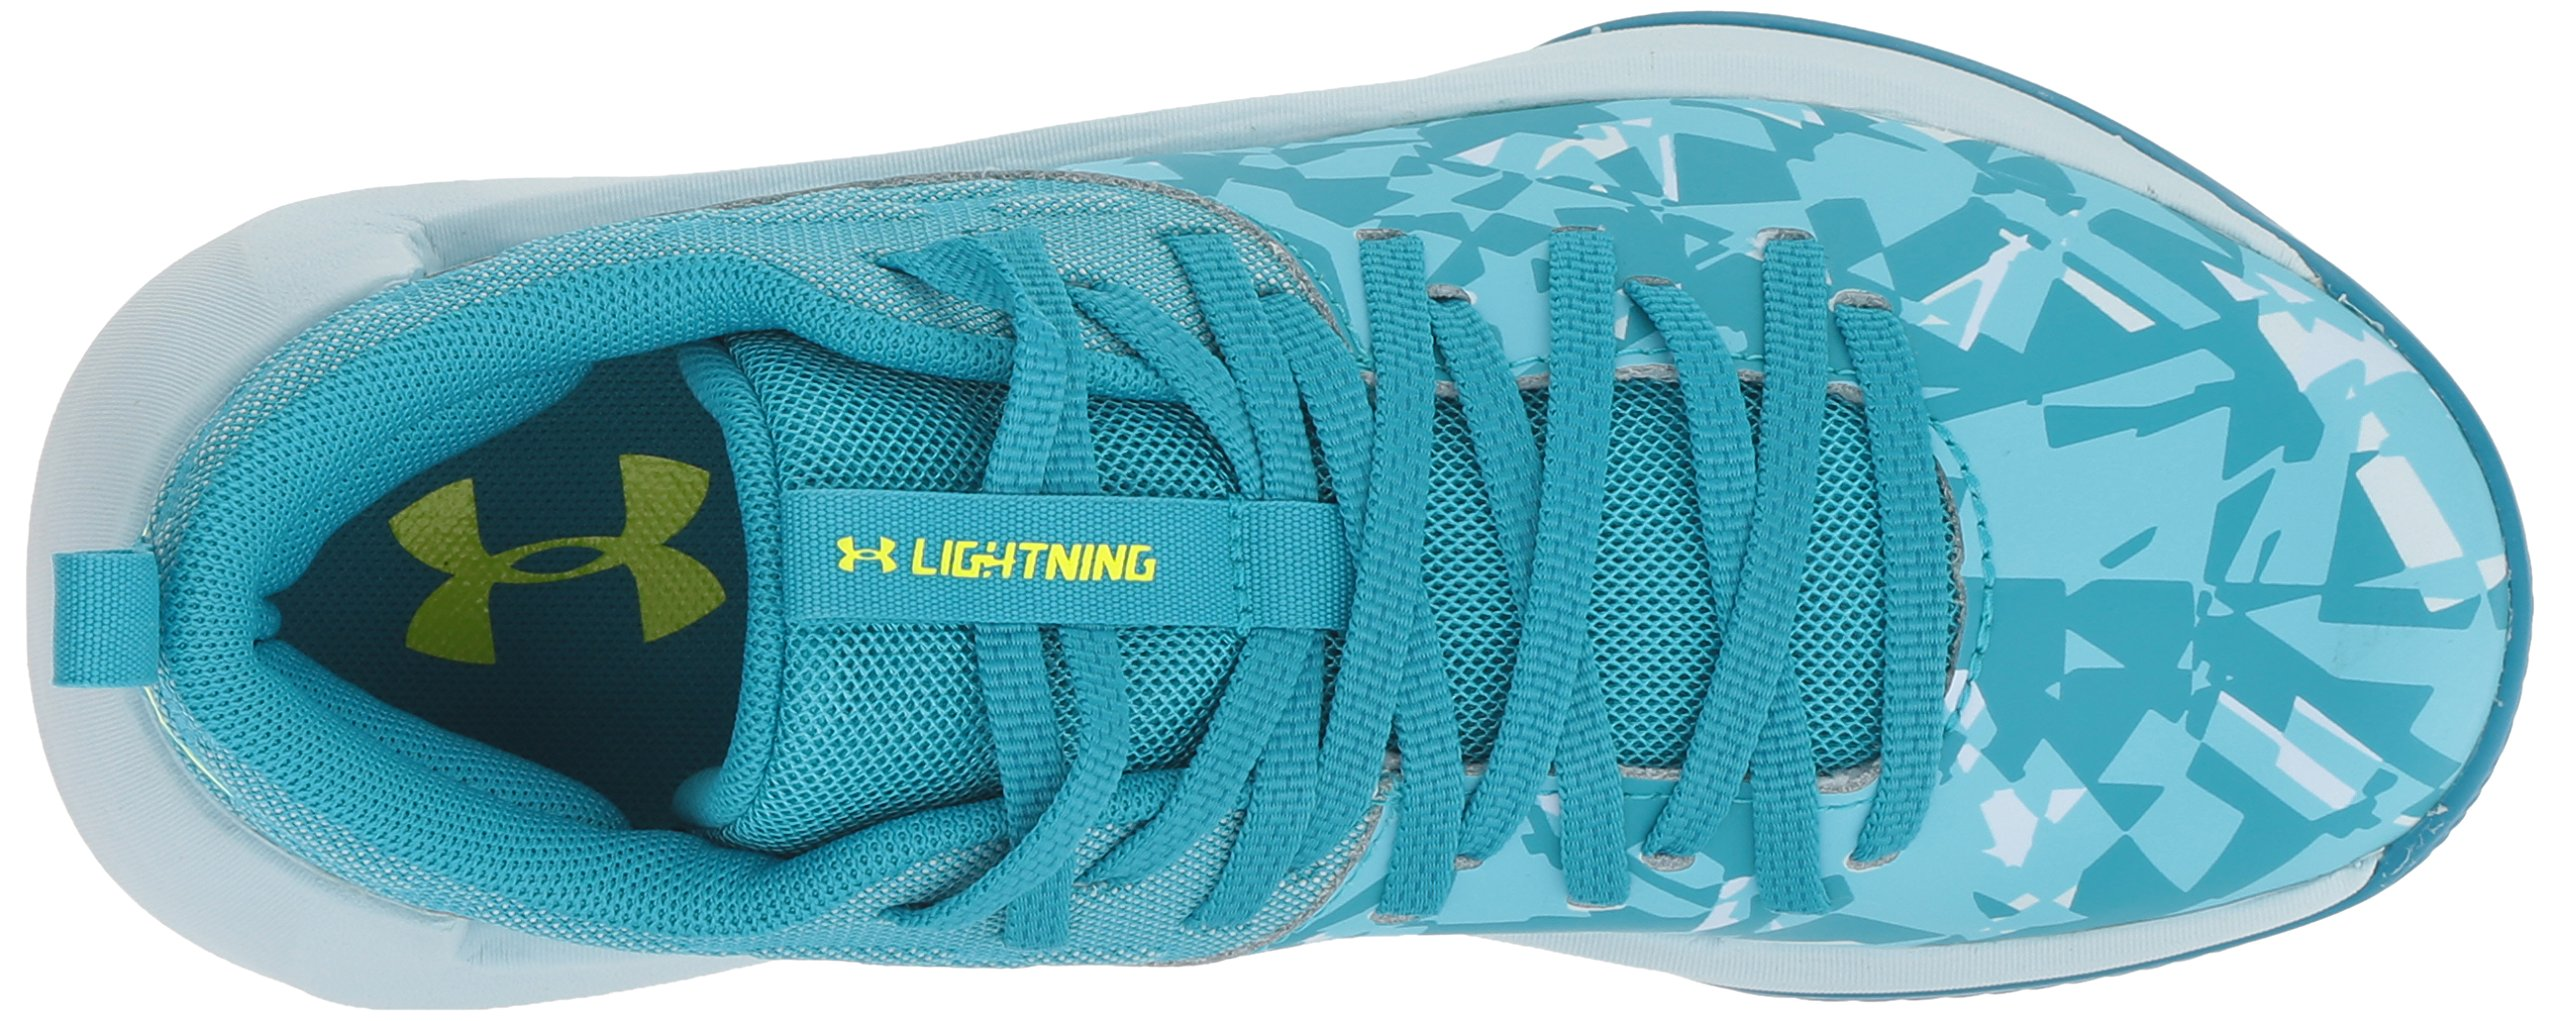 Under Armour Girls' Grade School Lightning 5 Basketball Shoe, Deceit (300)/Halogen Blue, 5.5 by Under Armour (Image #7)